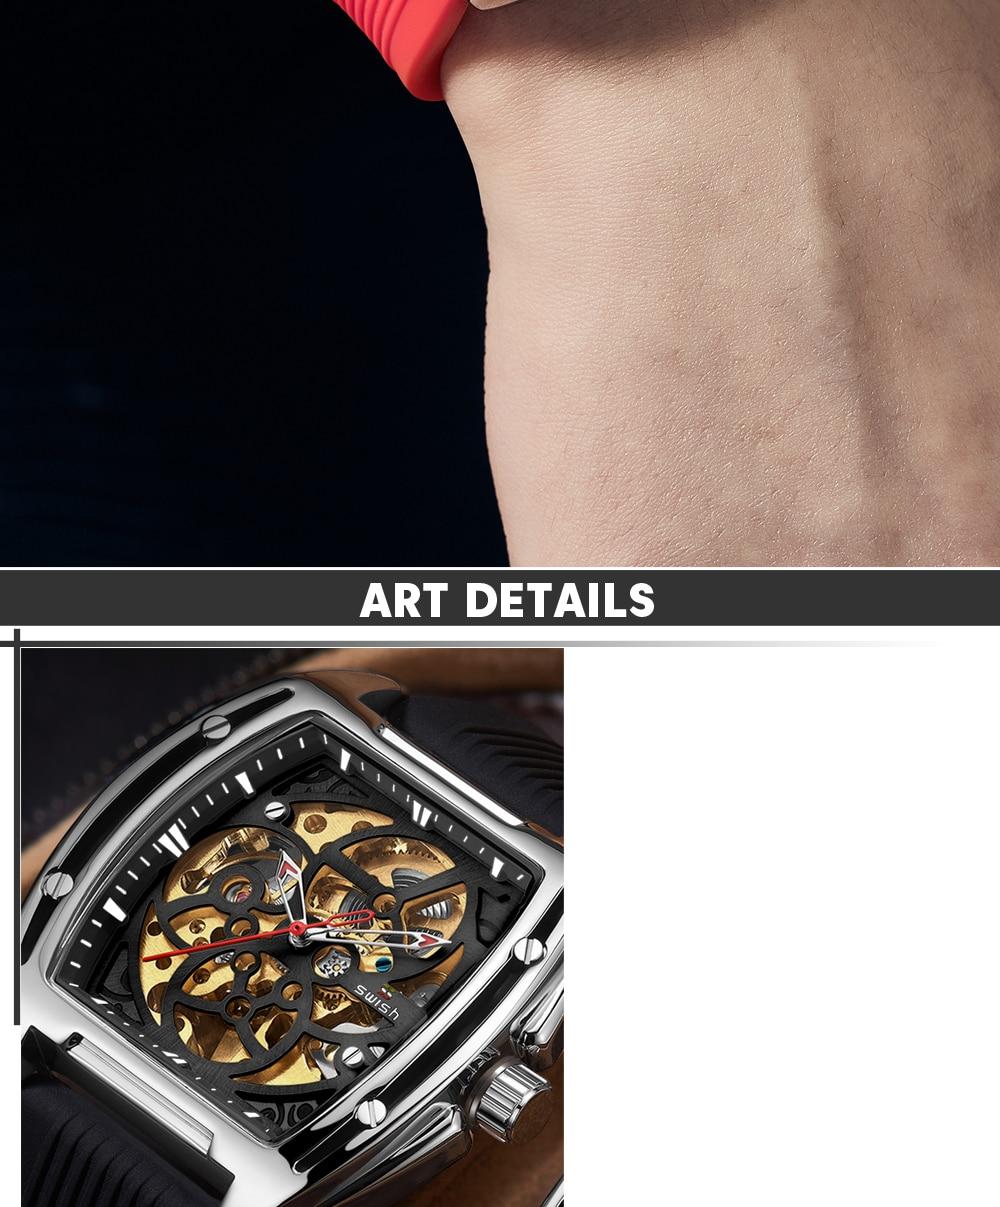 Habadd1cbedcb4ffeabe8aebed965fc1a4 SWISH Brand Design Luxury Men's Mechanical Wristwatch